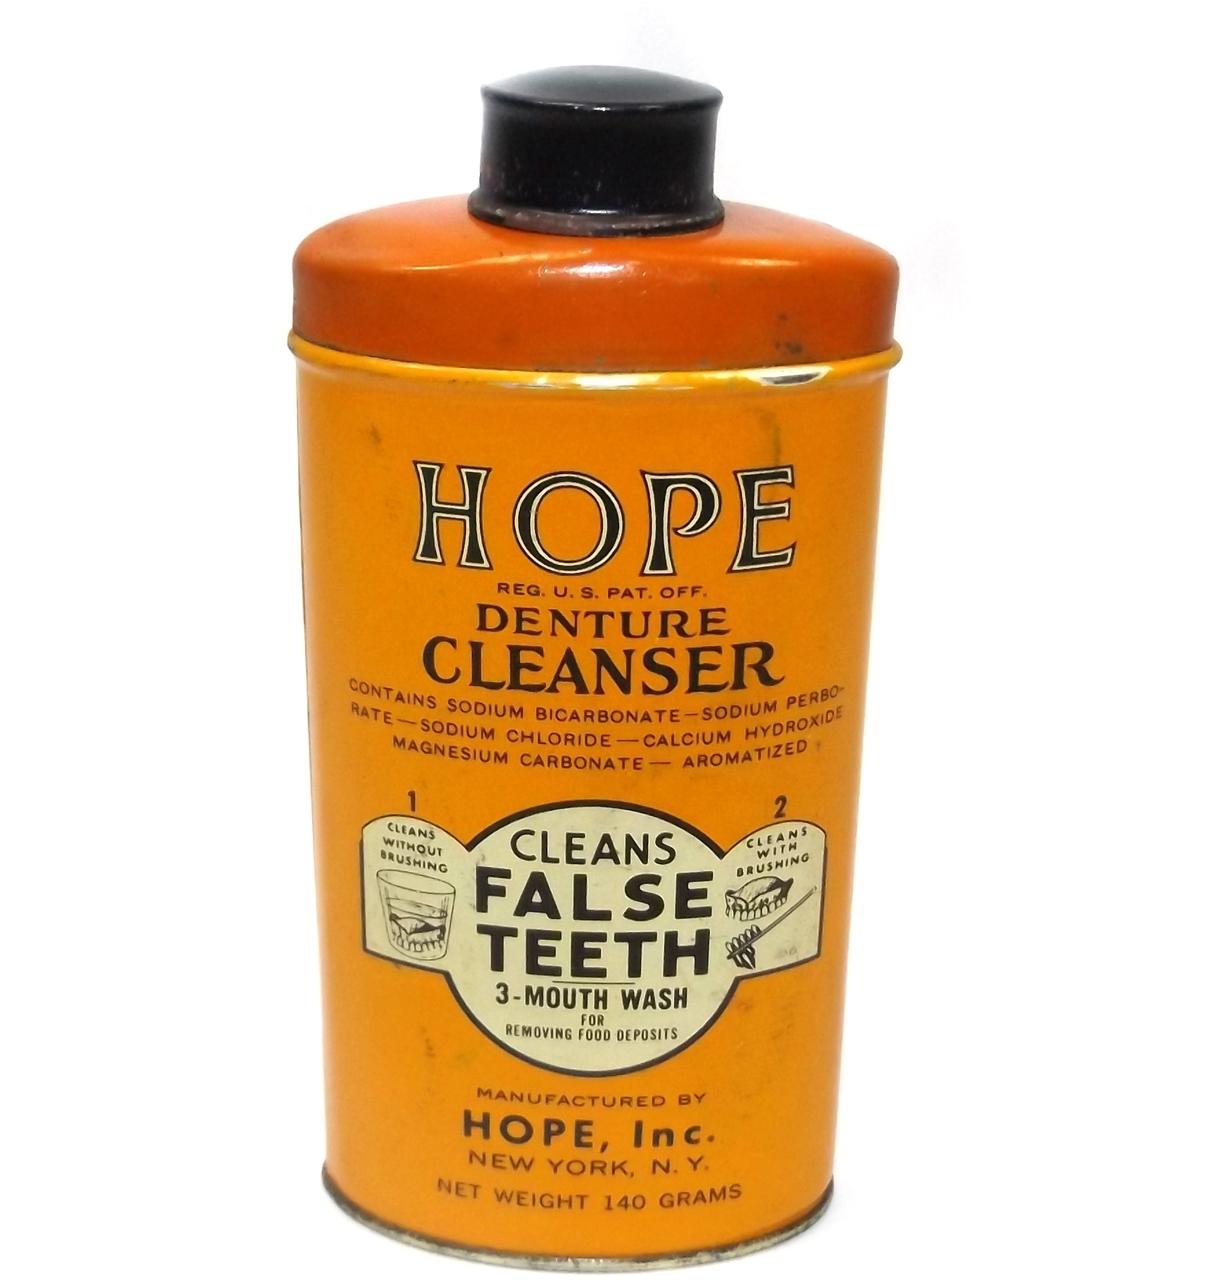 Abc Dental Care details about vintage hope denture cleanser dental false teeth cleaning  powder advertising tin